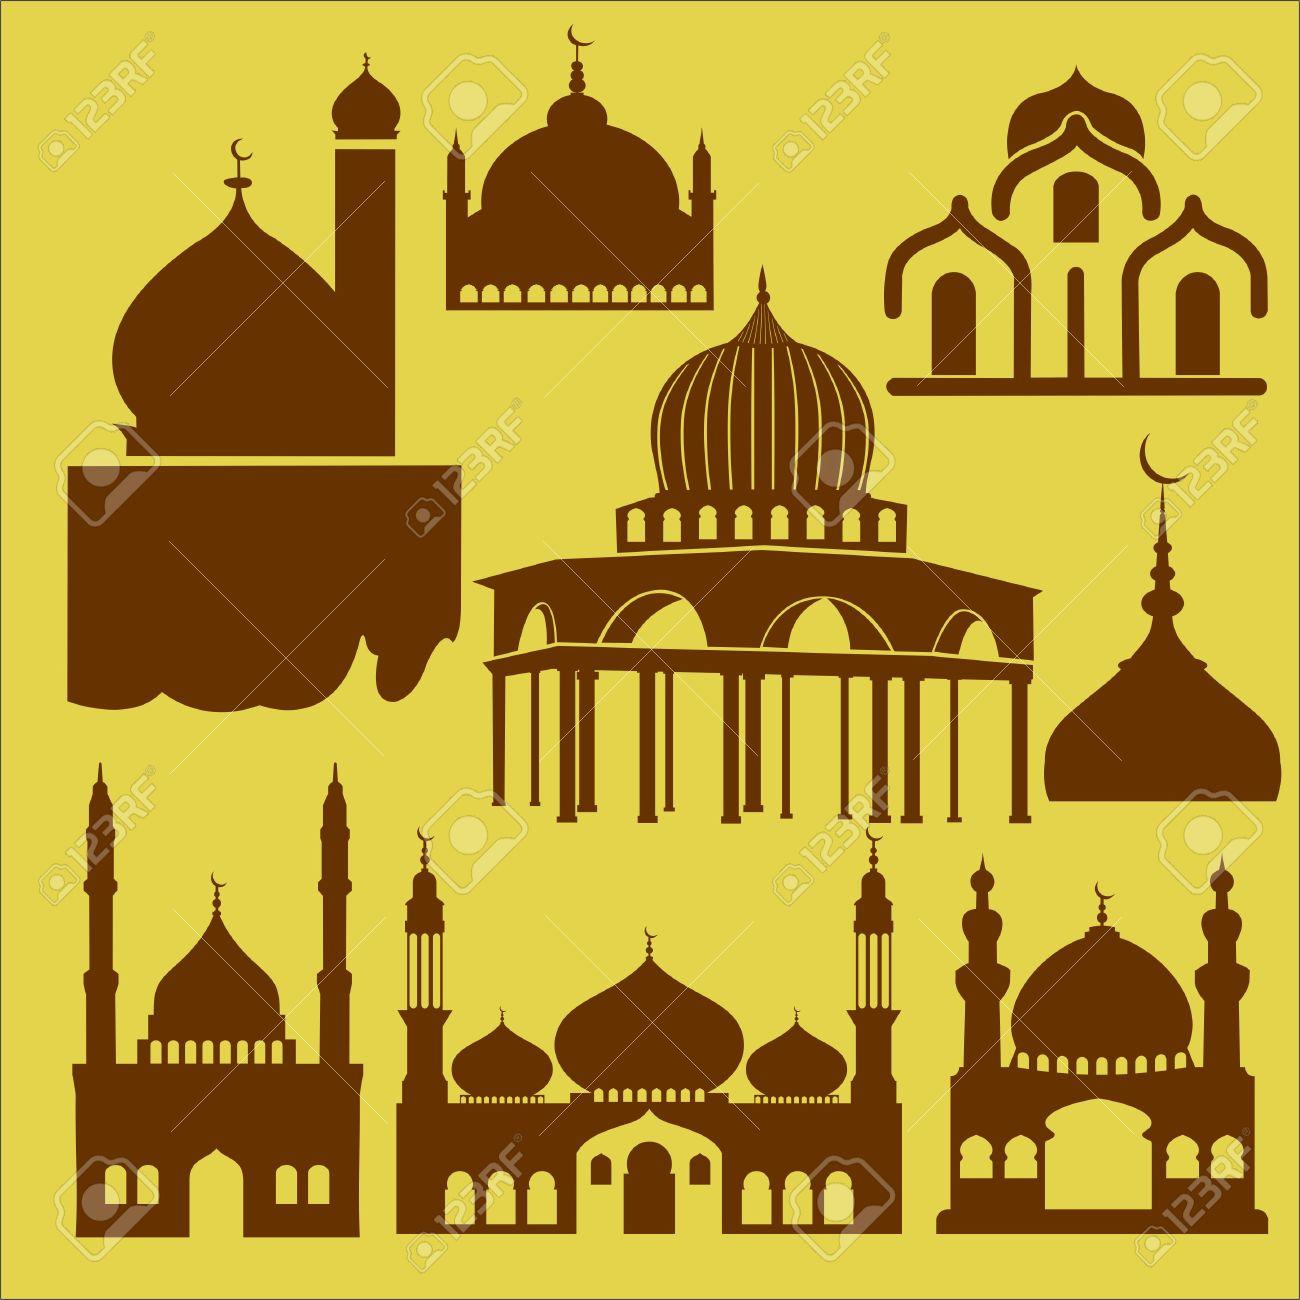 Mezquita Vector Clipart Digital 3 Ilustraciones Vectoriales, Clip.